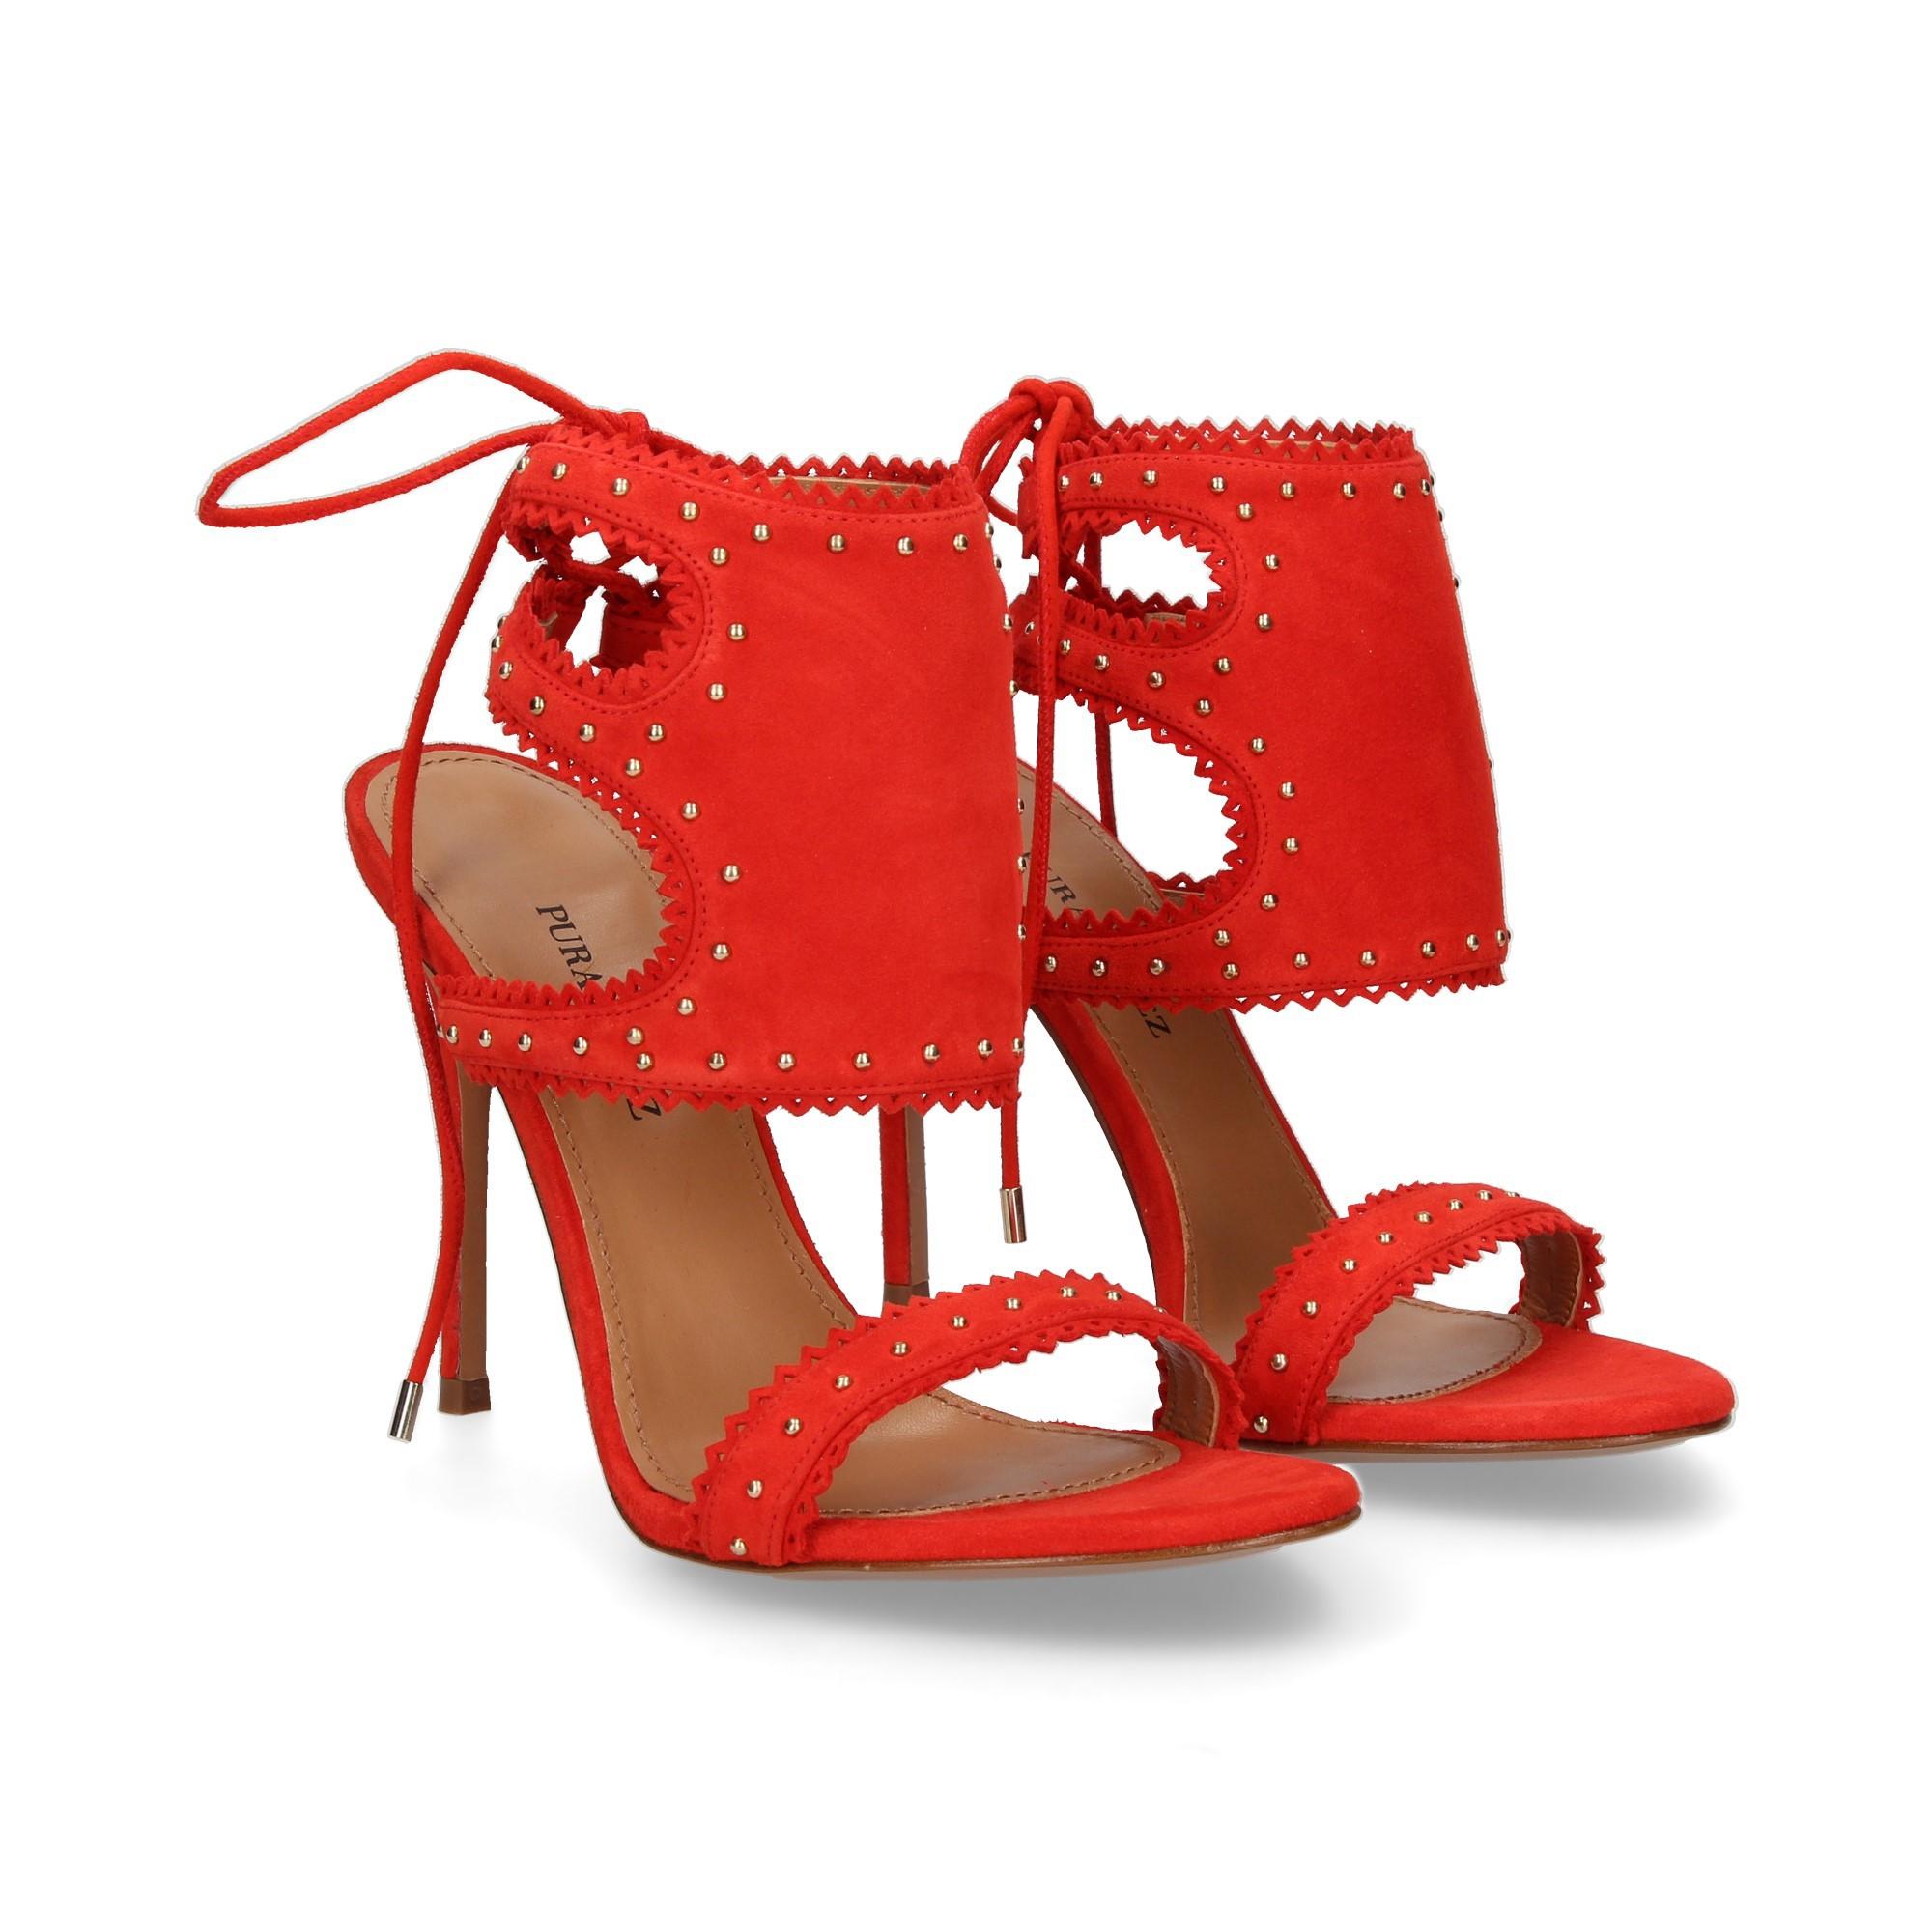 Camiscio Sandalo Tacco Sandalo Rosso Rosso Sandalo Tacco Tacco Sandalo Camiscio Rosso Camiscio Tacco WYHDIE29